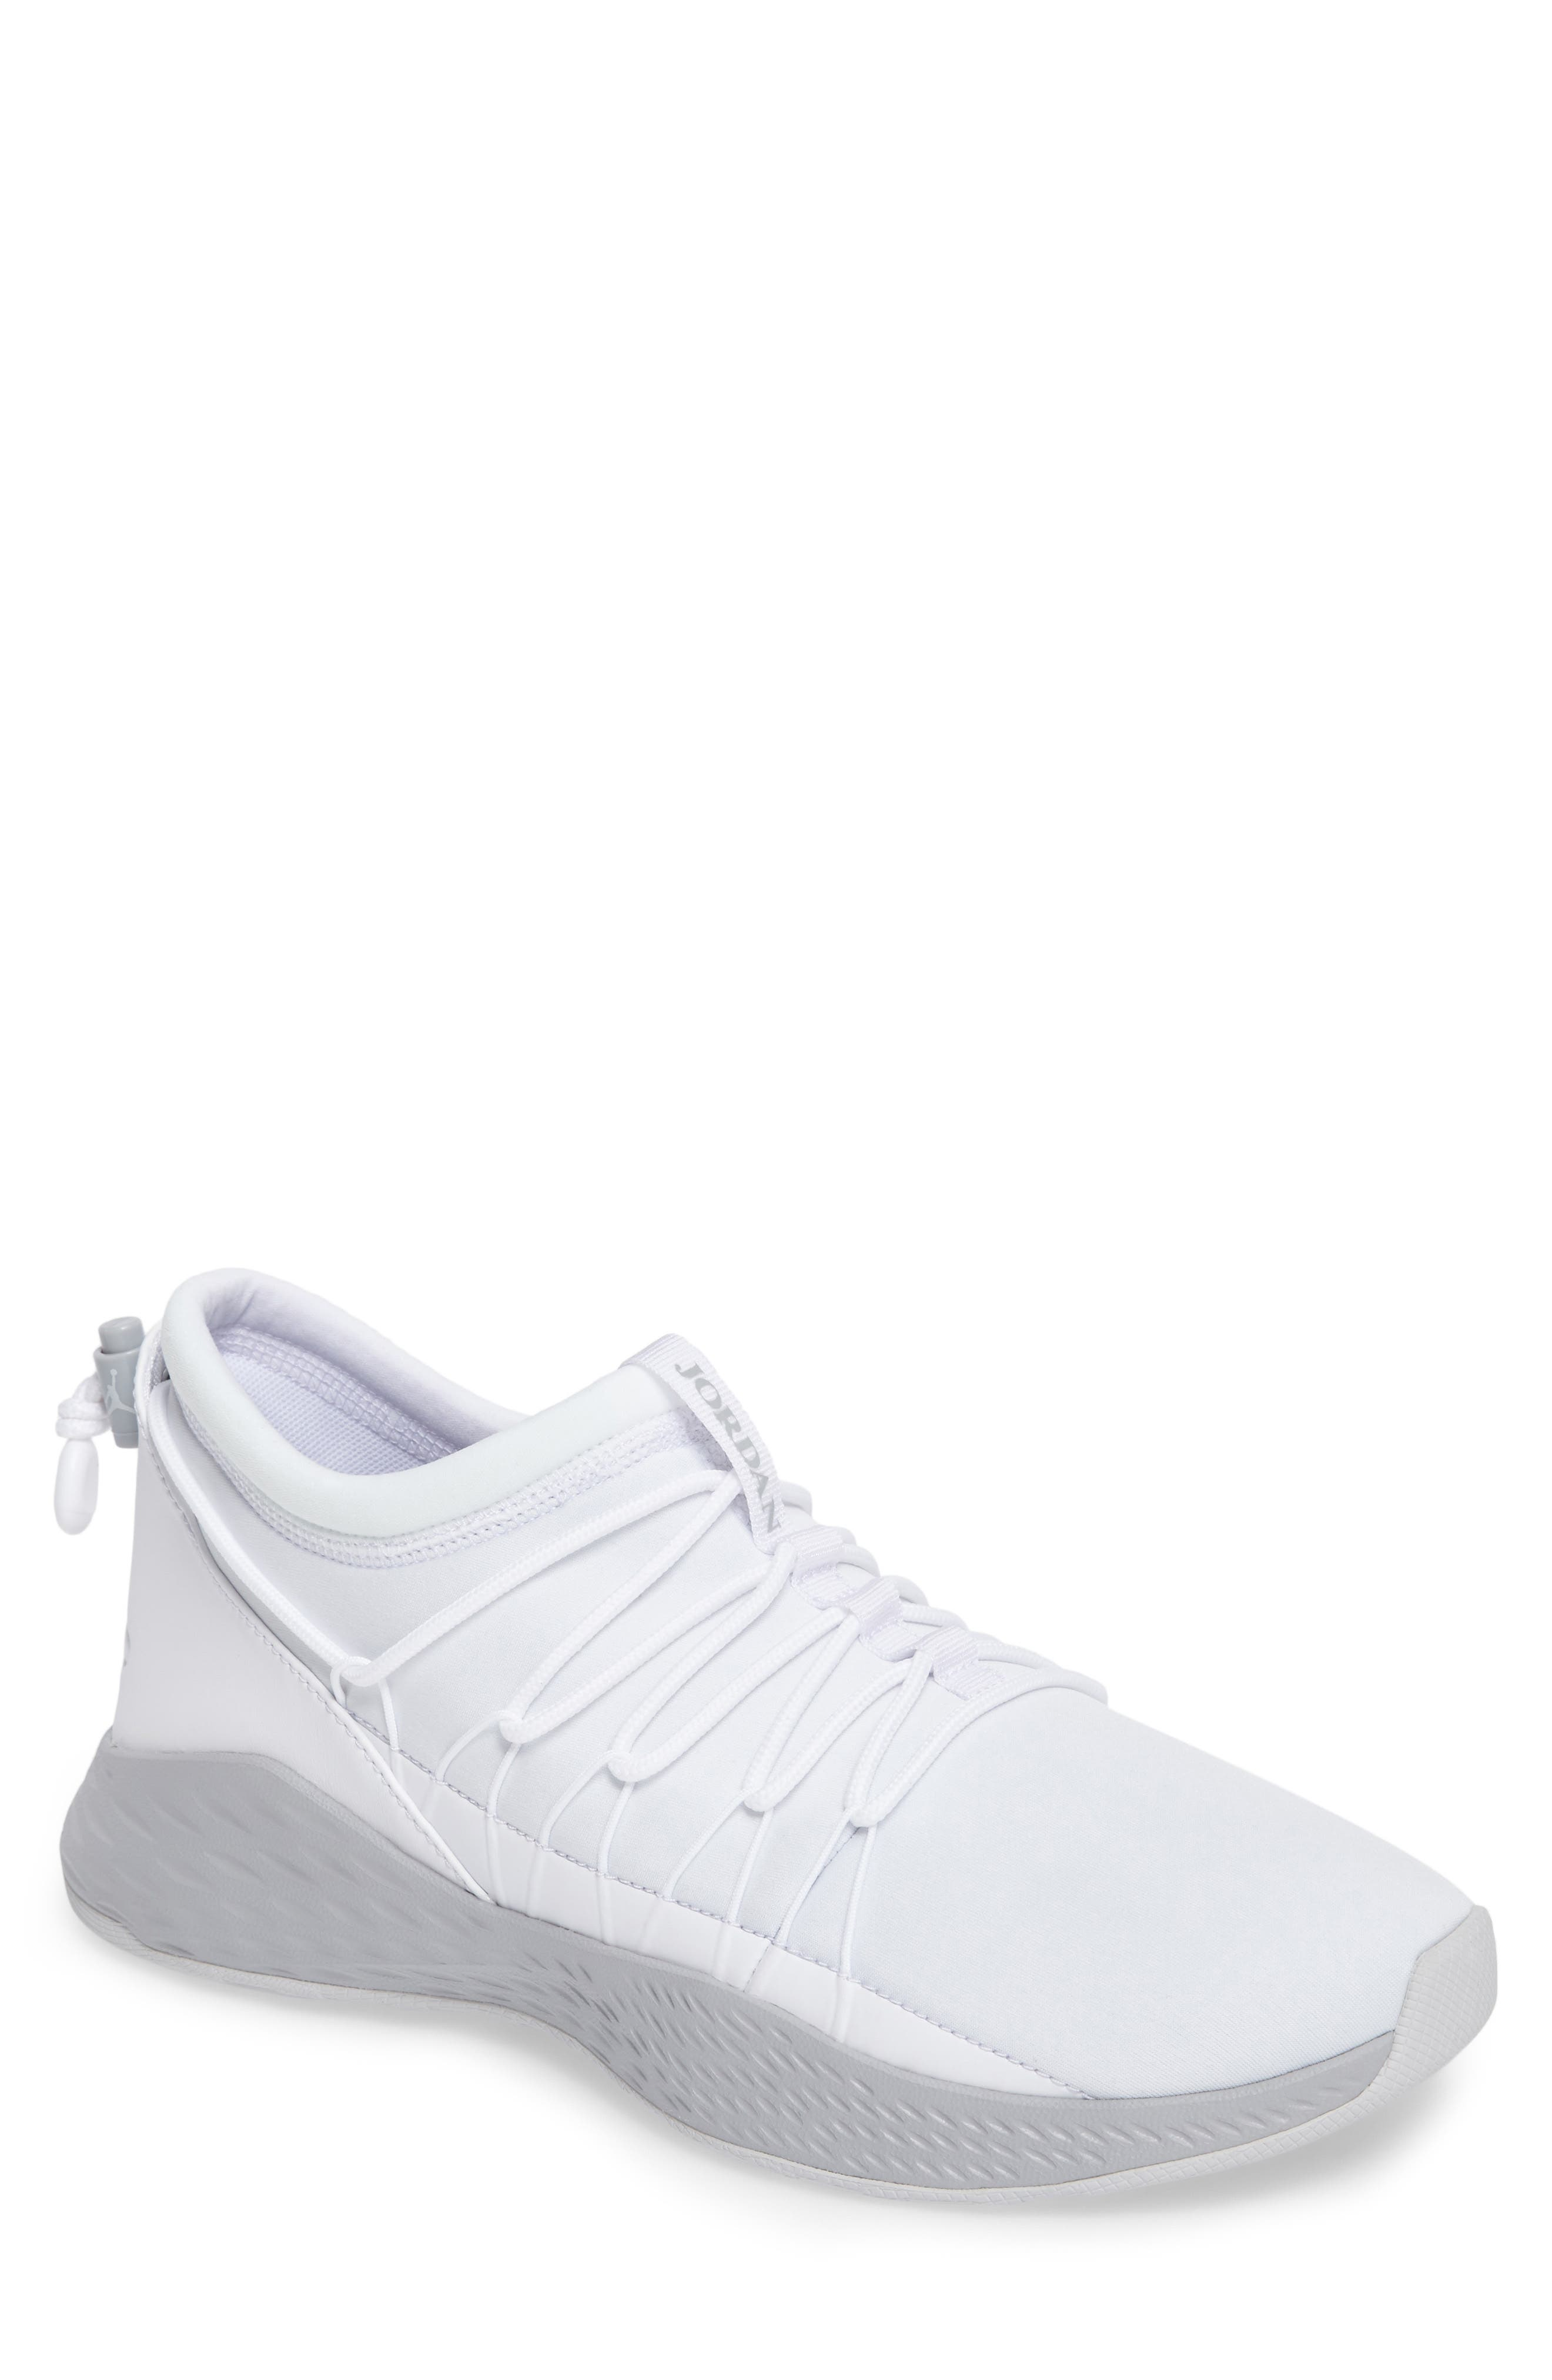 Main Image - Nike Jordan Formula 23 Toggle Basketball Shoe (Men)